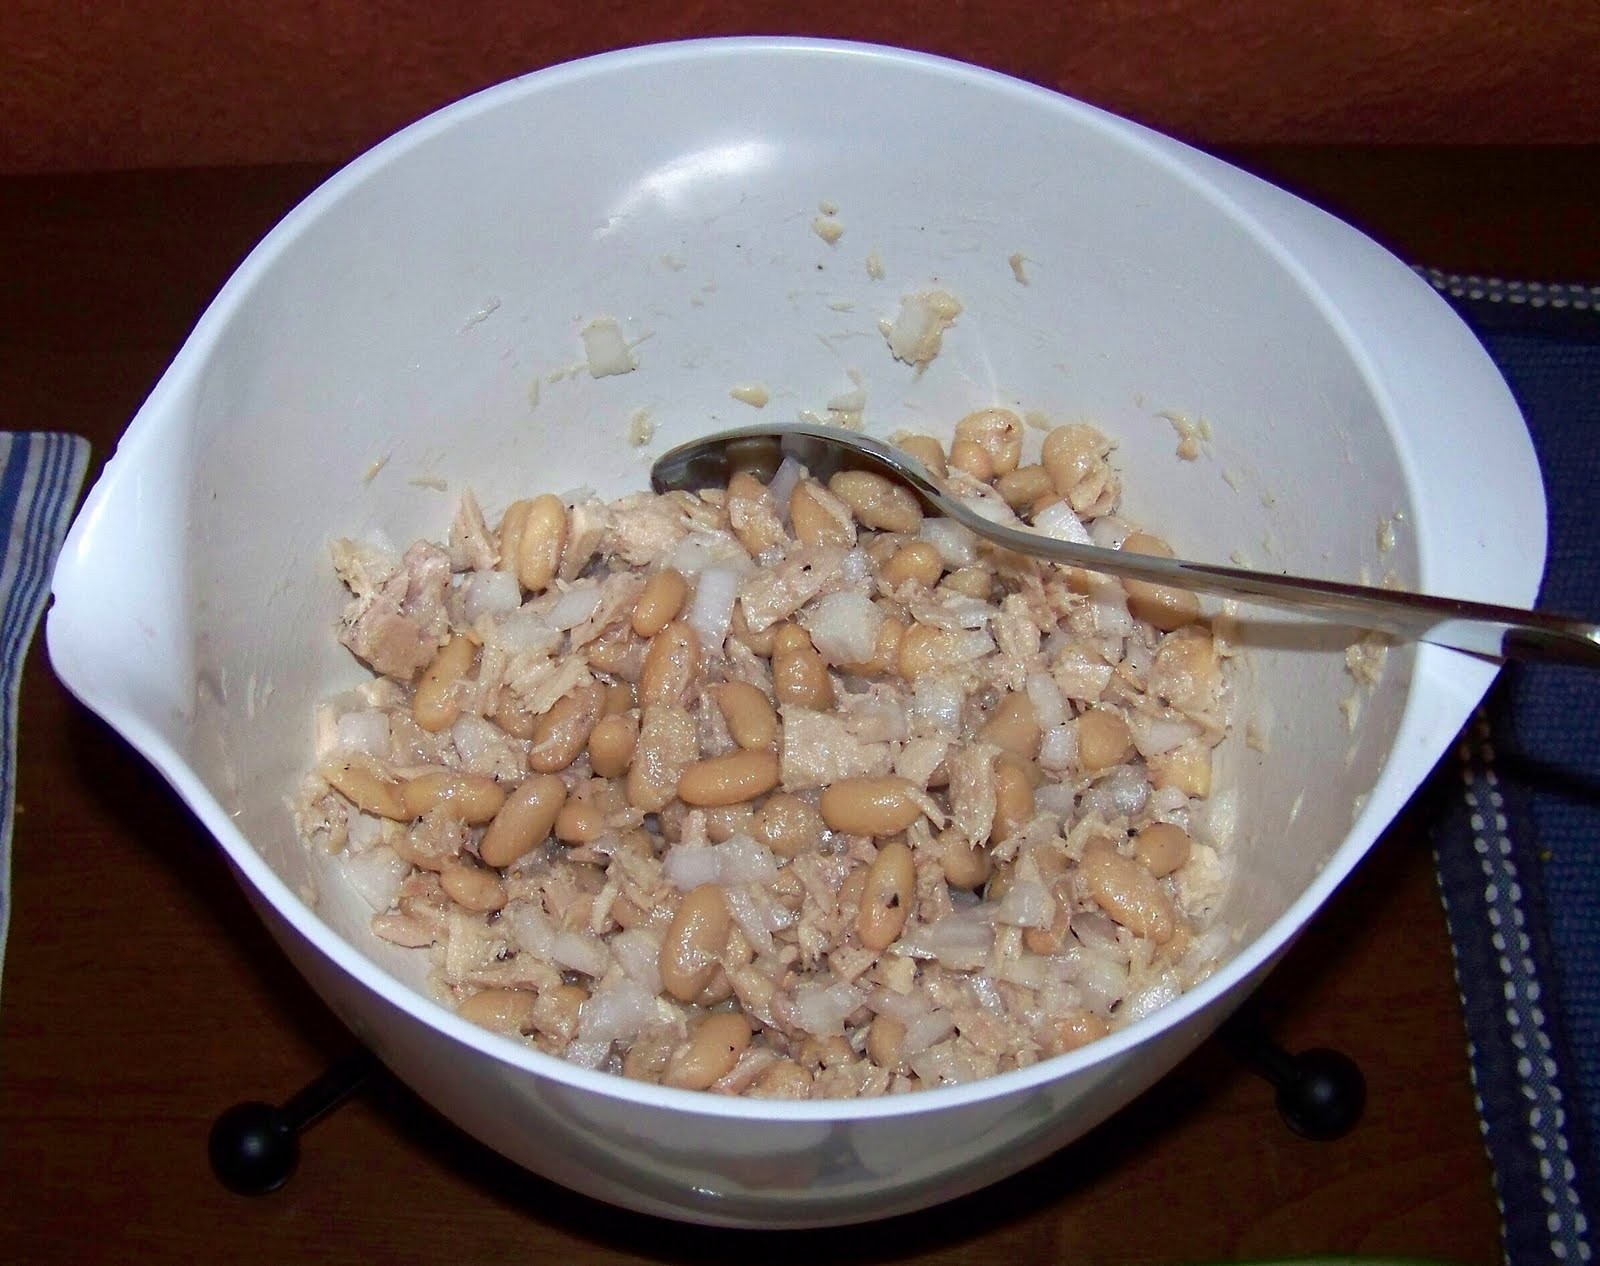 ... Cuisine: Dinner-Caprese Salad & Tuna Salad with Cannellini Beans